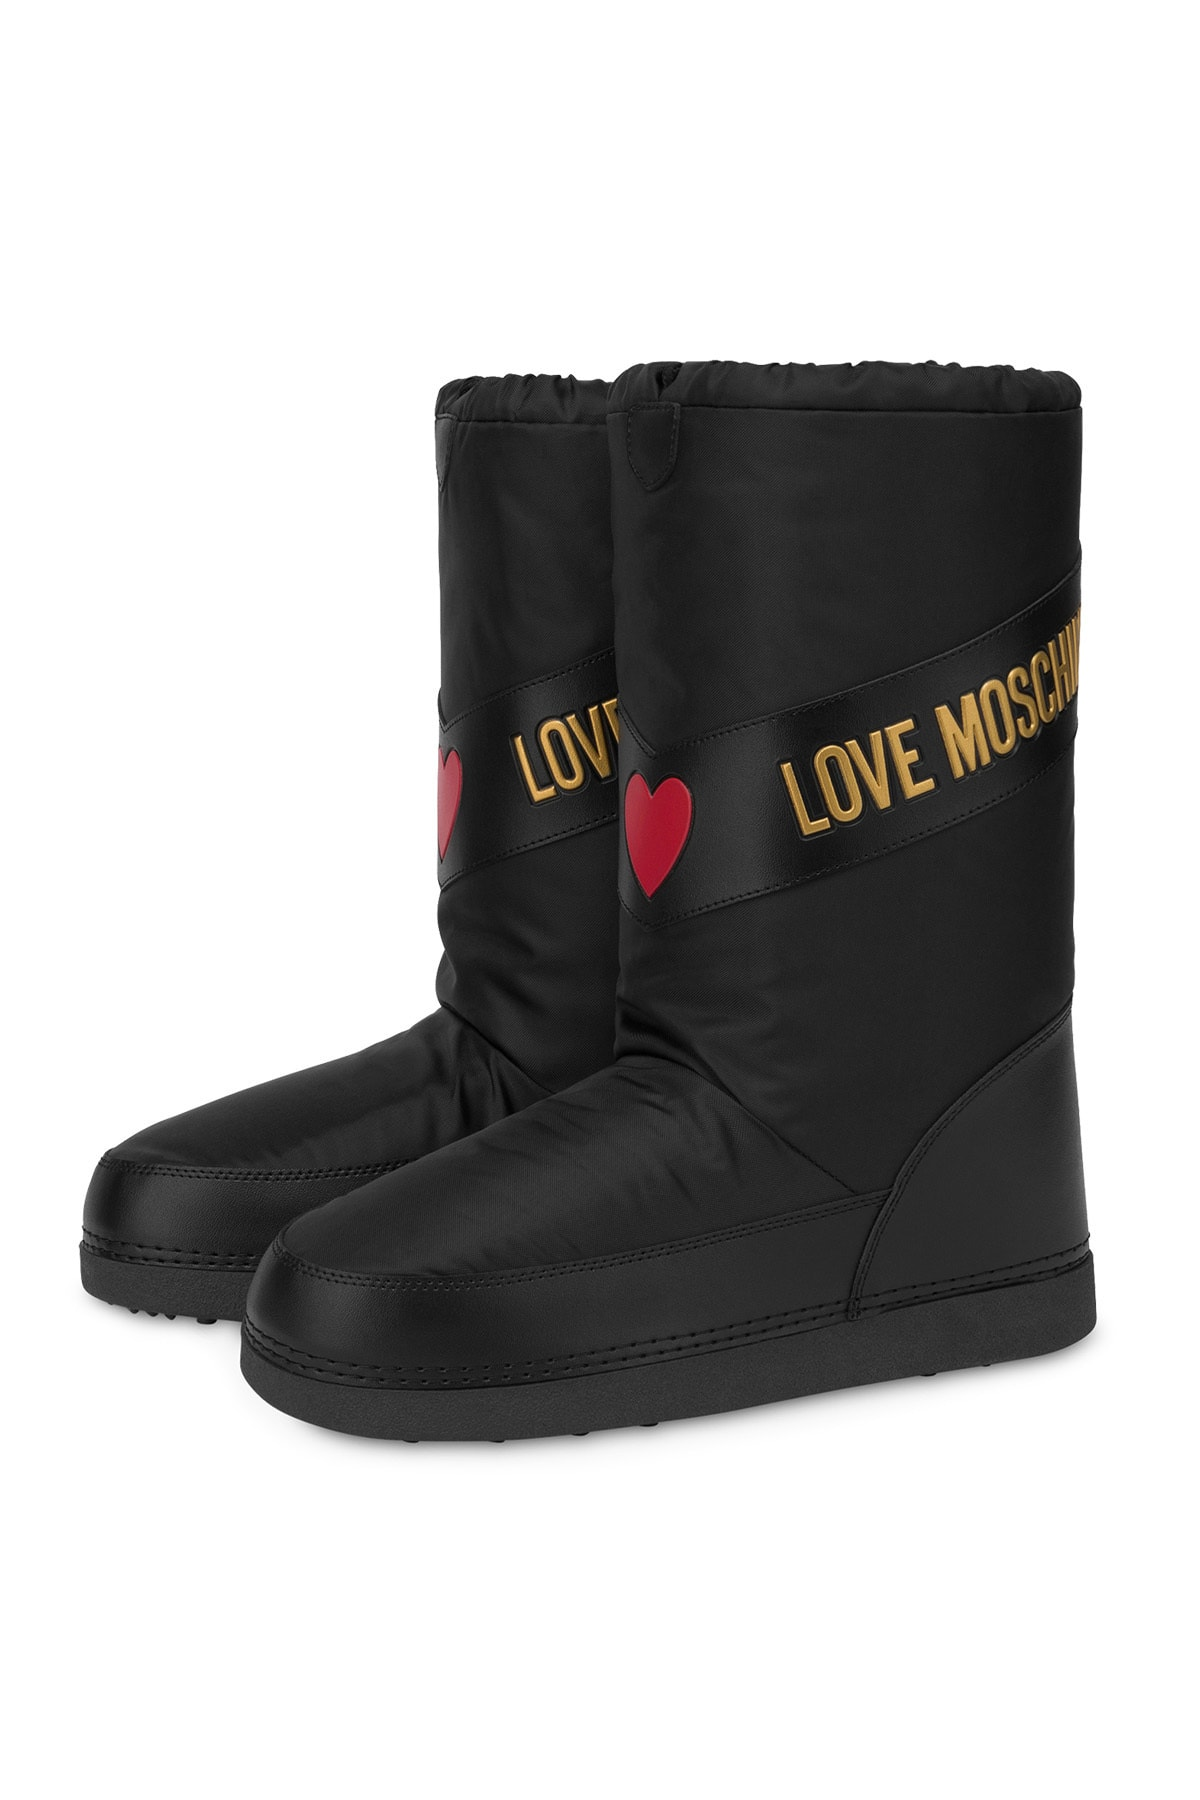 Love Moschino Kadın Bot Ja24012g0bıu3000 2